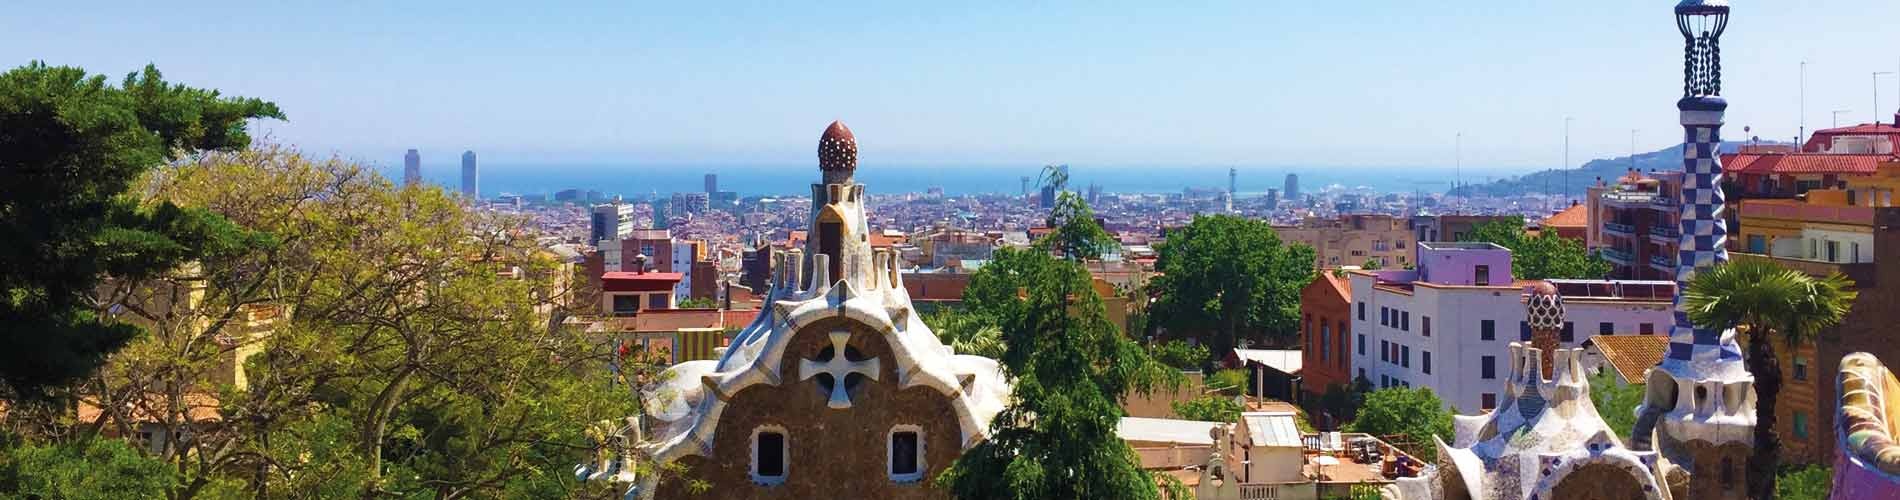 Blog_SoloTravel_VDay_Barcelona_1900x500_Q120